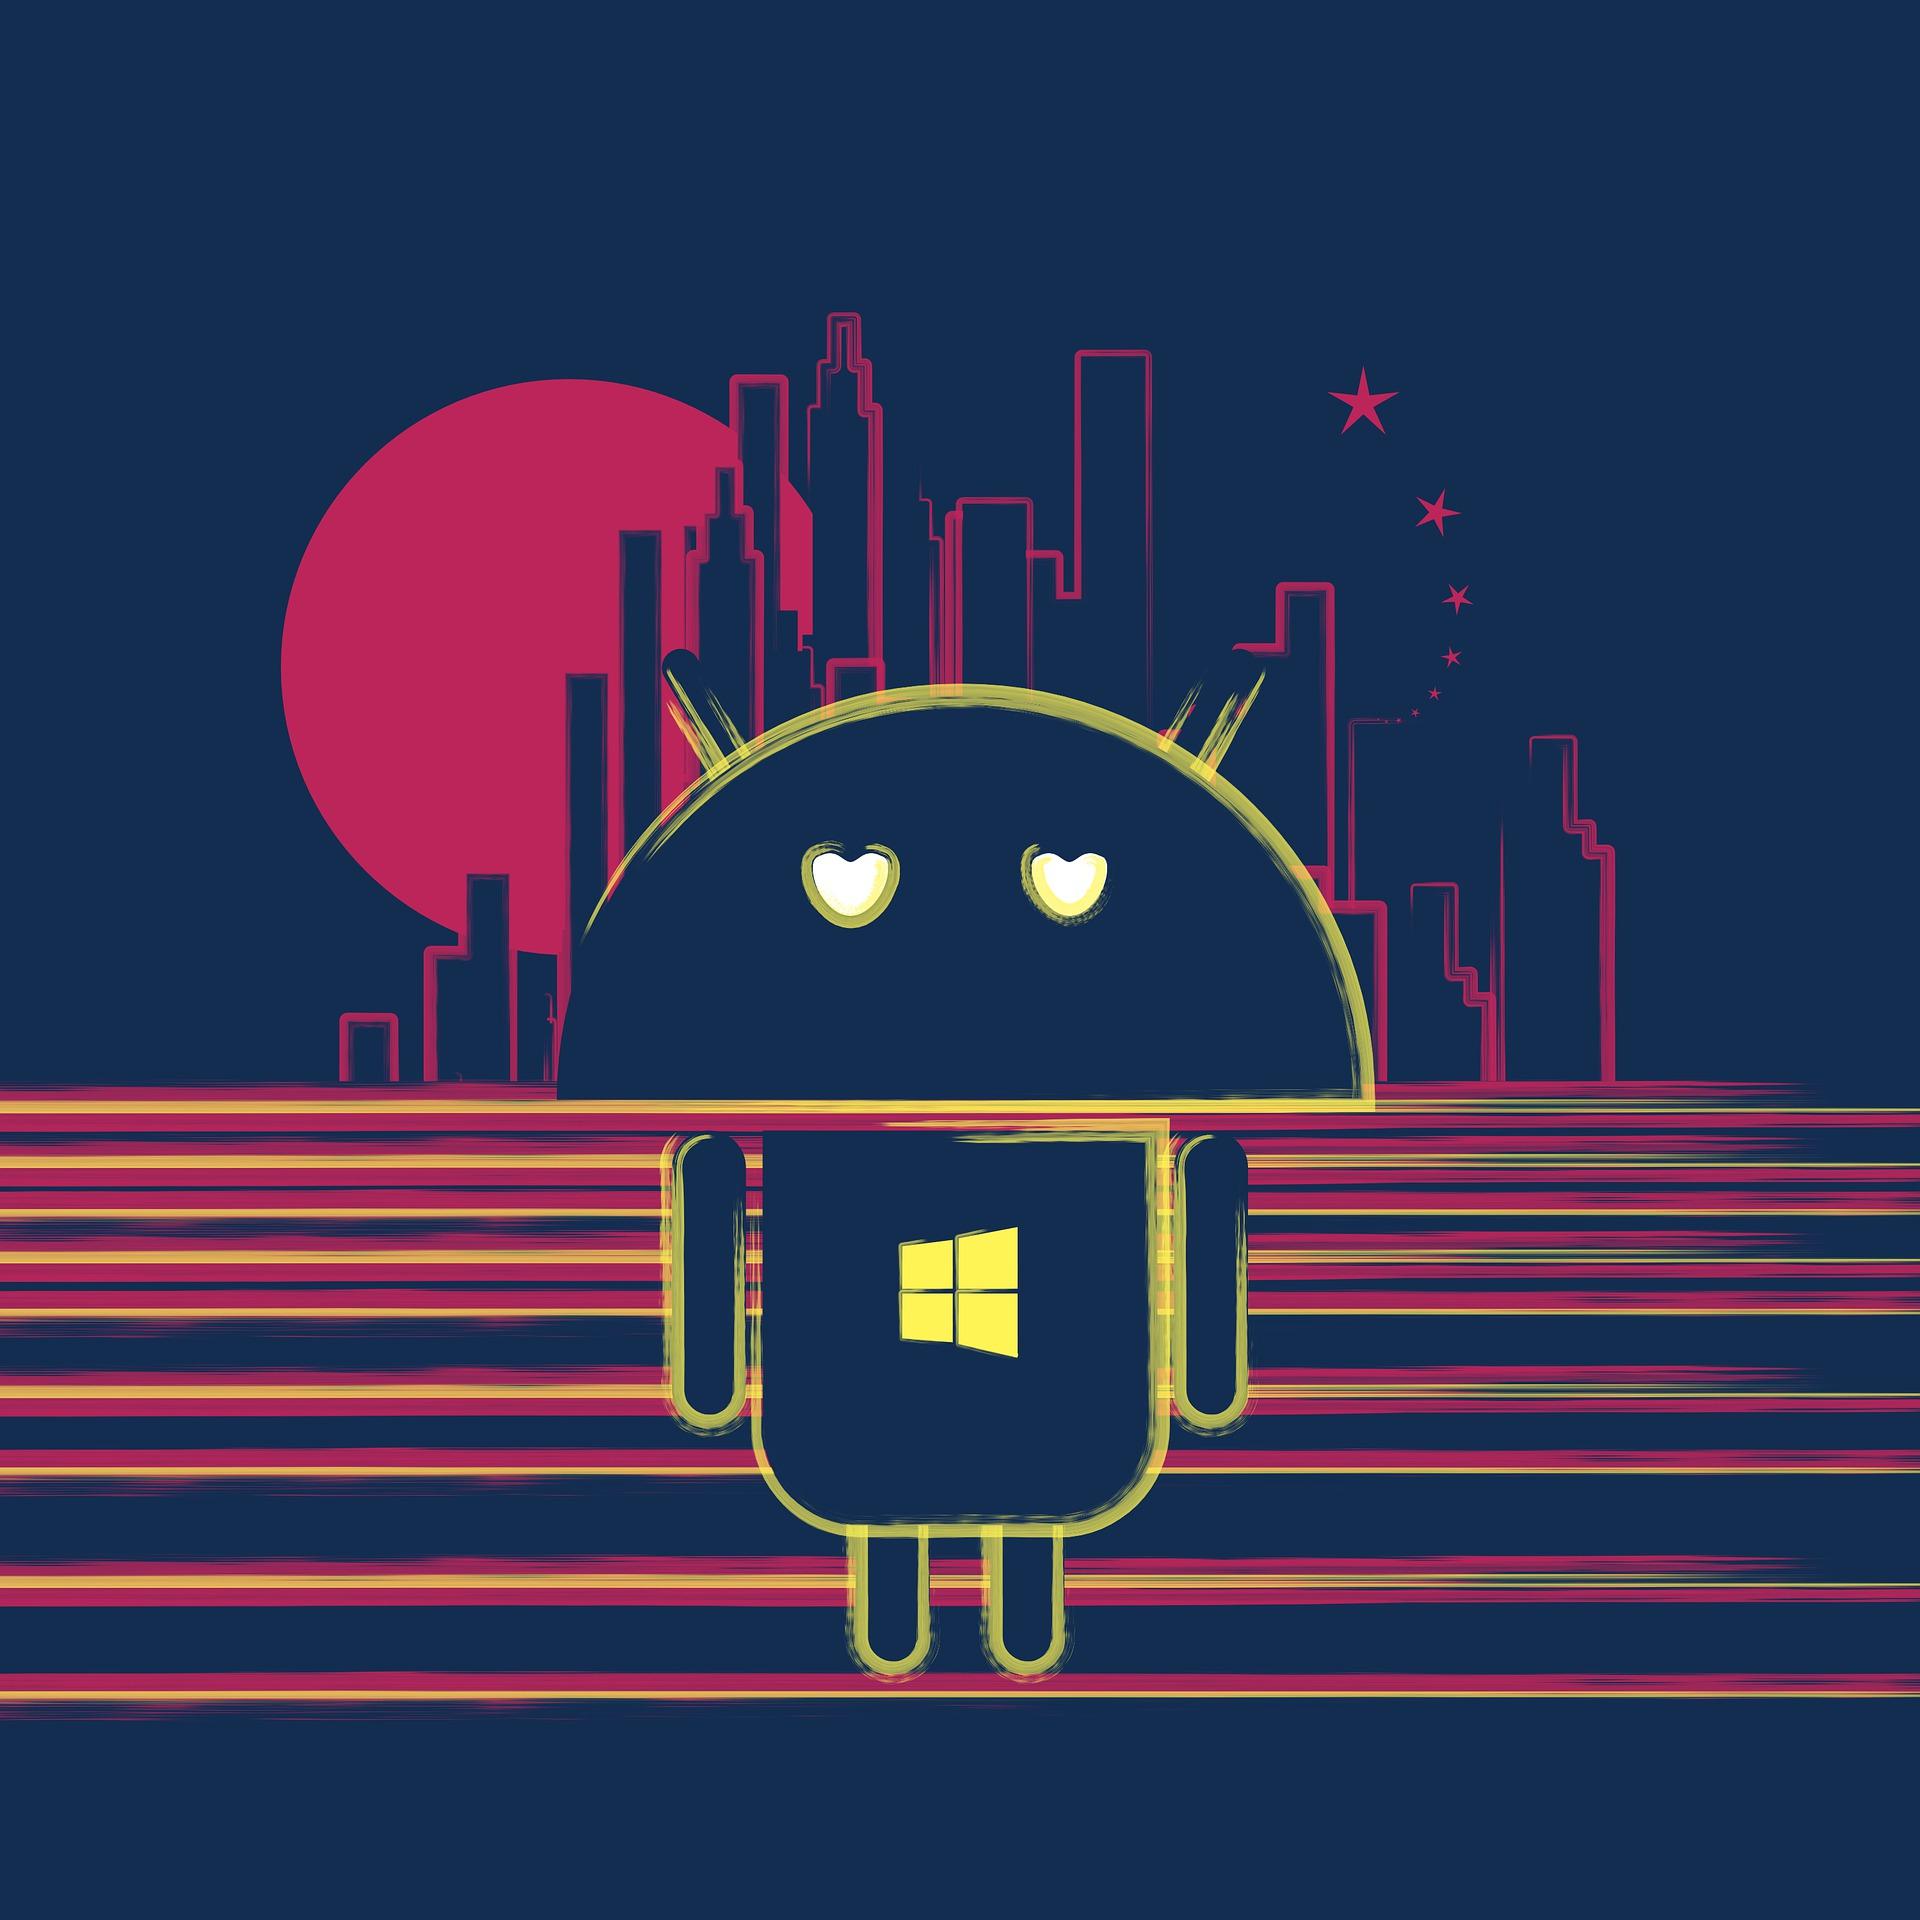 Windows 10 синхронизация с Android что нужно